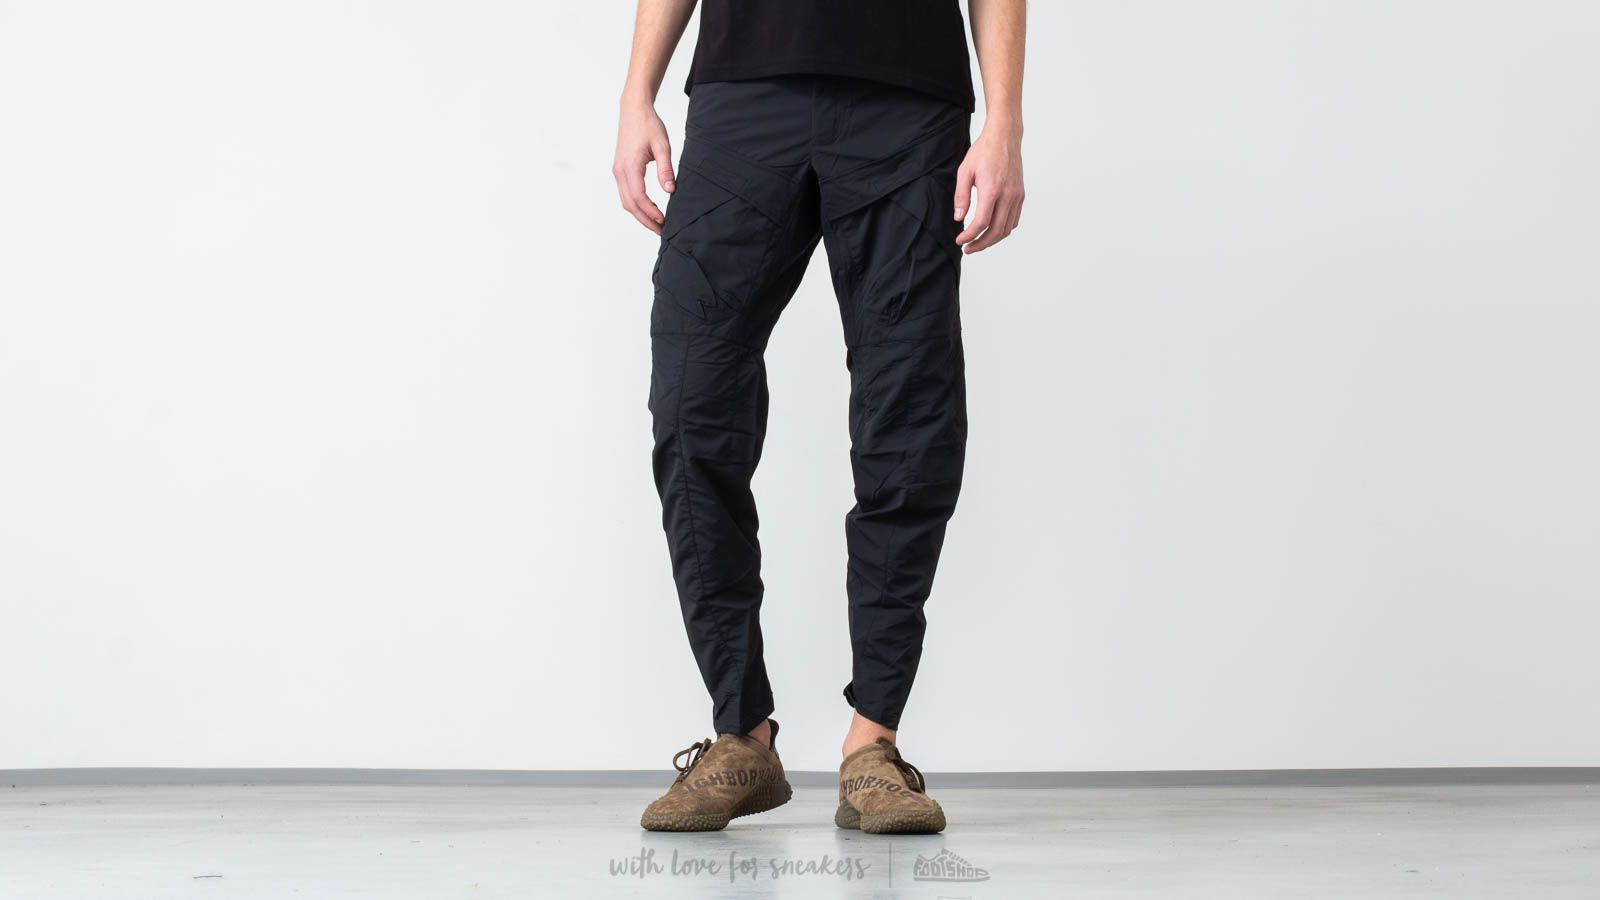 Riot Division 2 Pockets Pants Modified Black